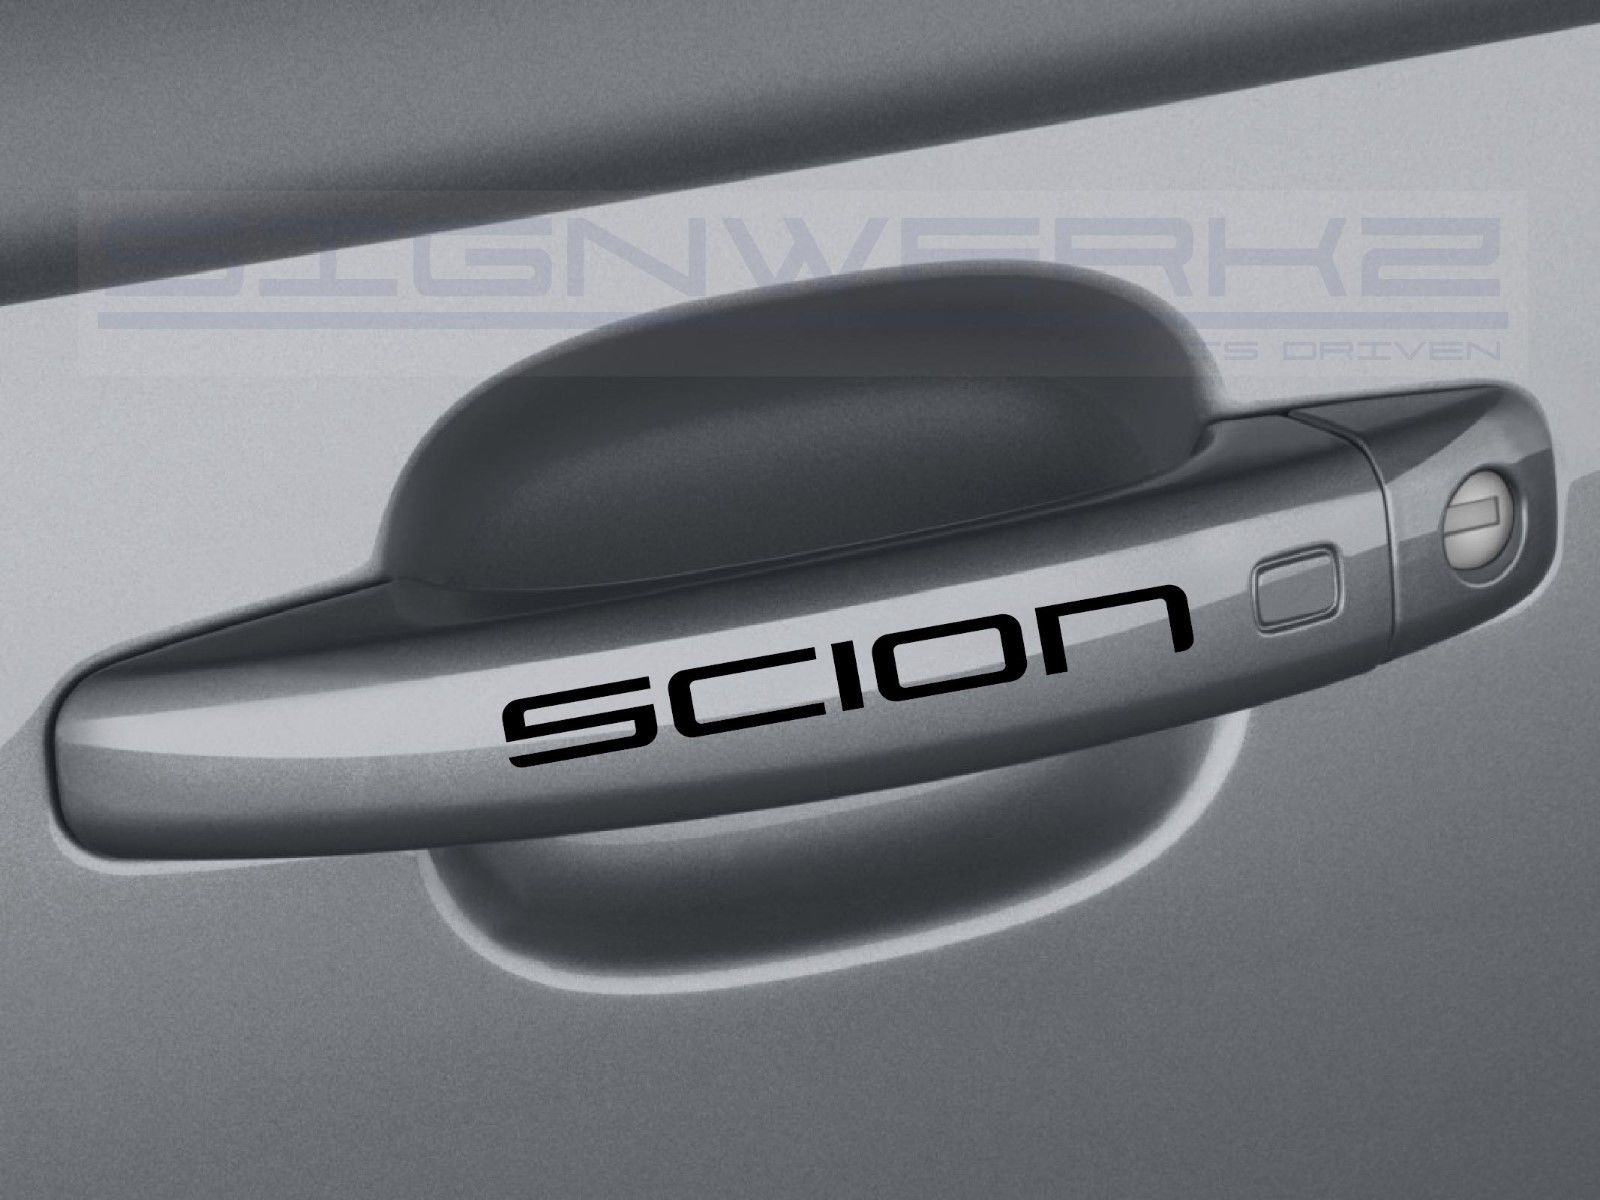 14 15 16 Mazda6 Sedan Front Bumper Cover Assembly Primed MA1000238 GHP950031BBB